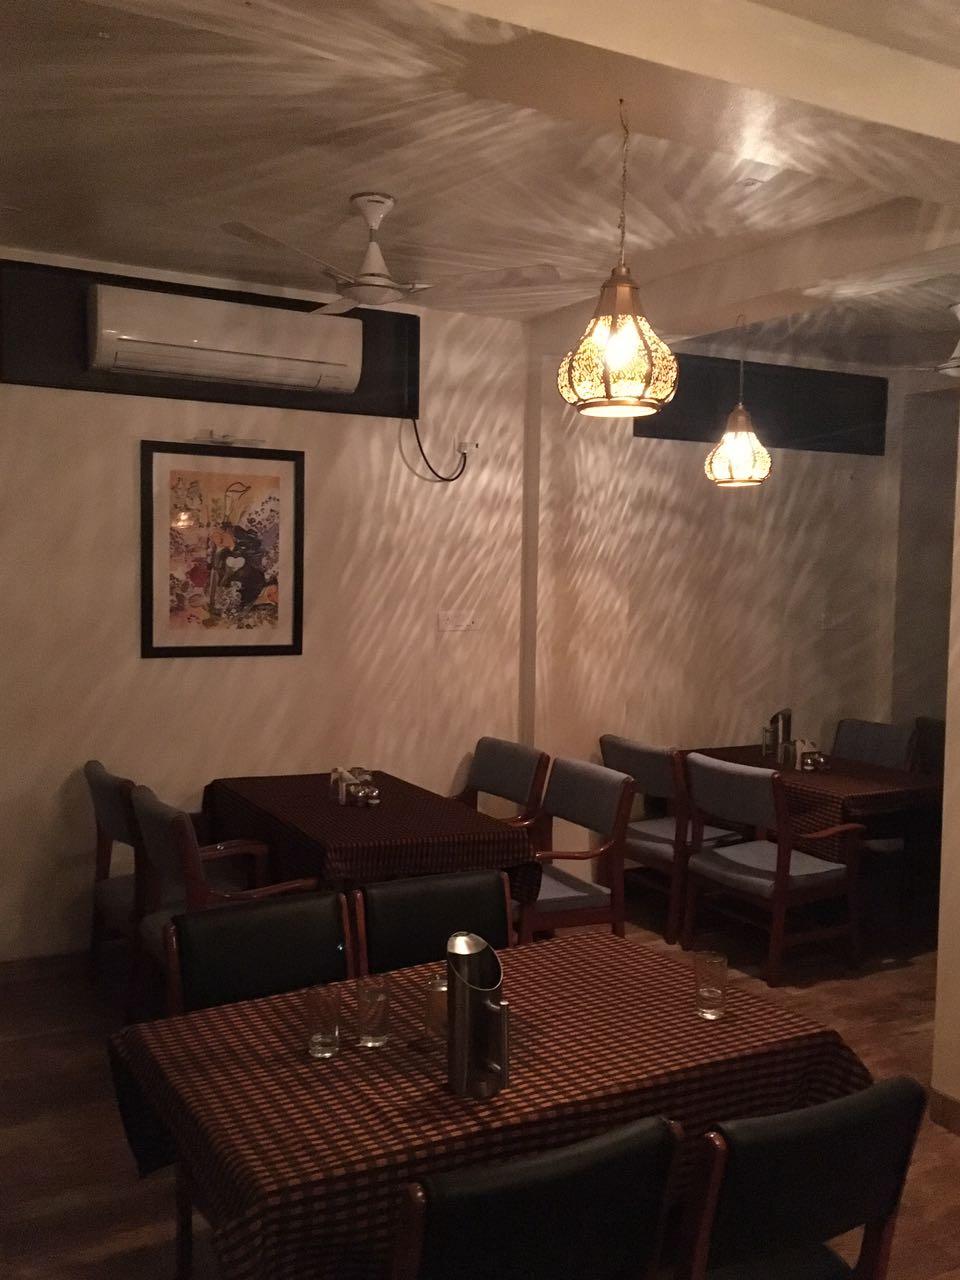 dawat restaurant